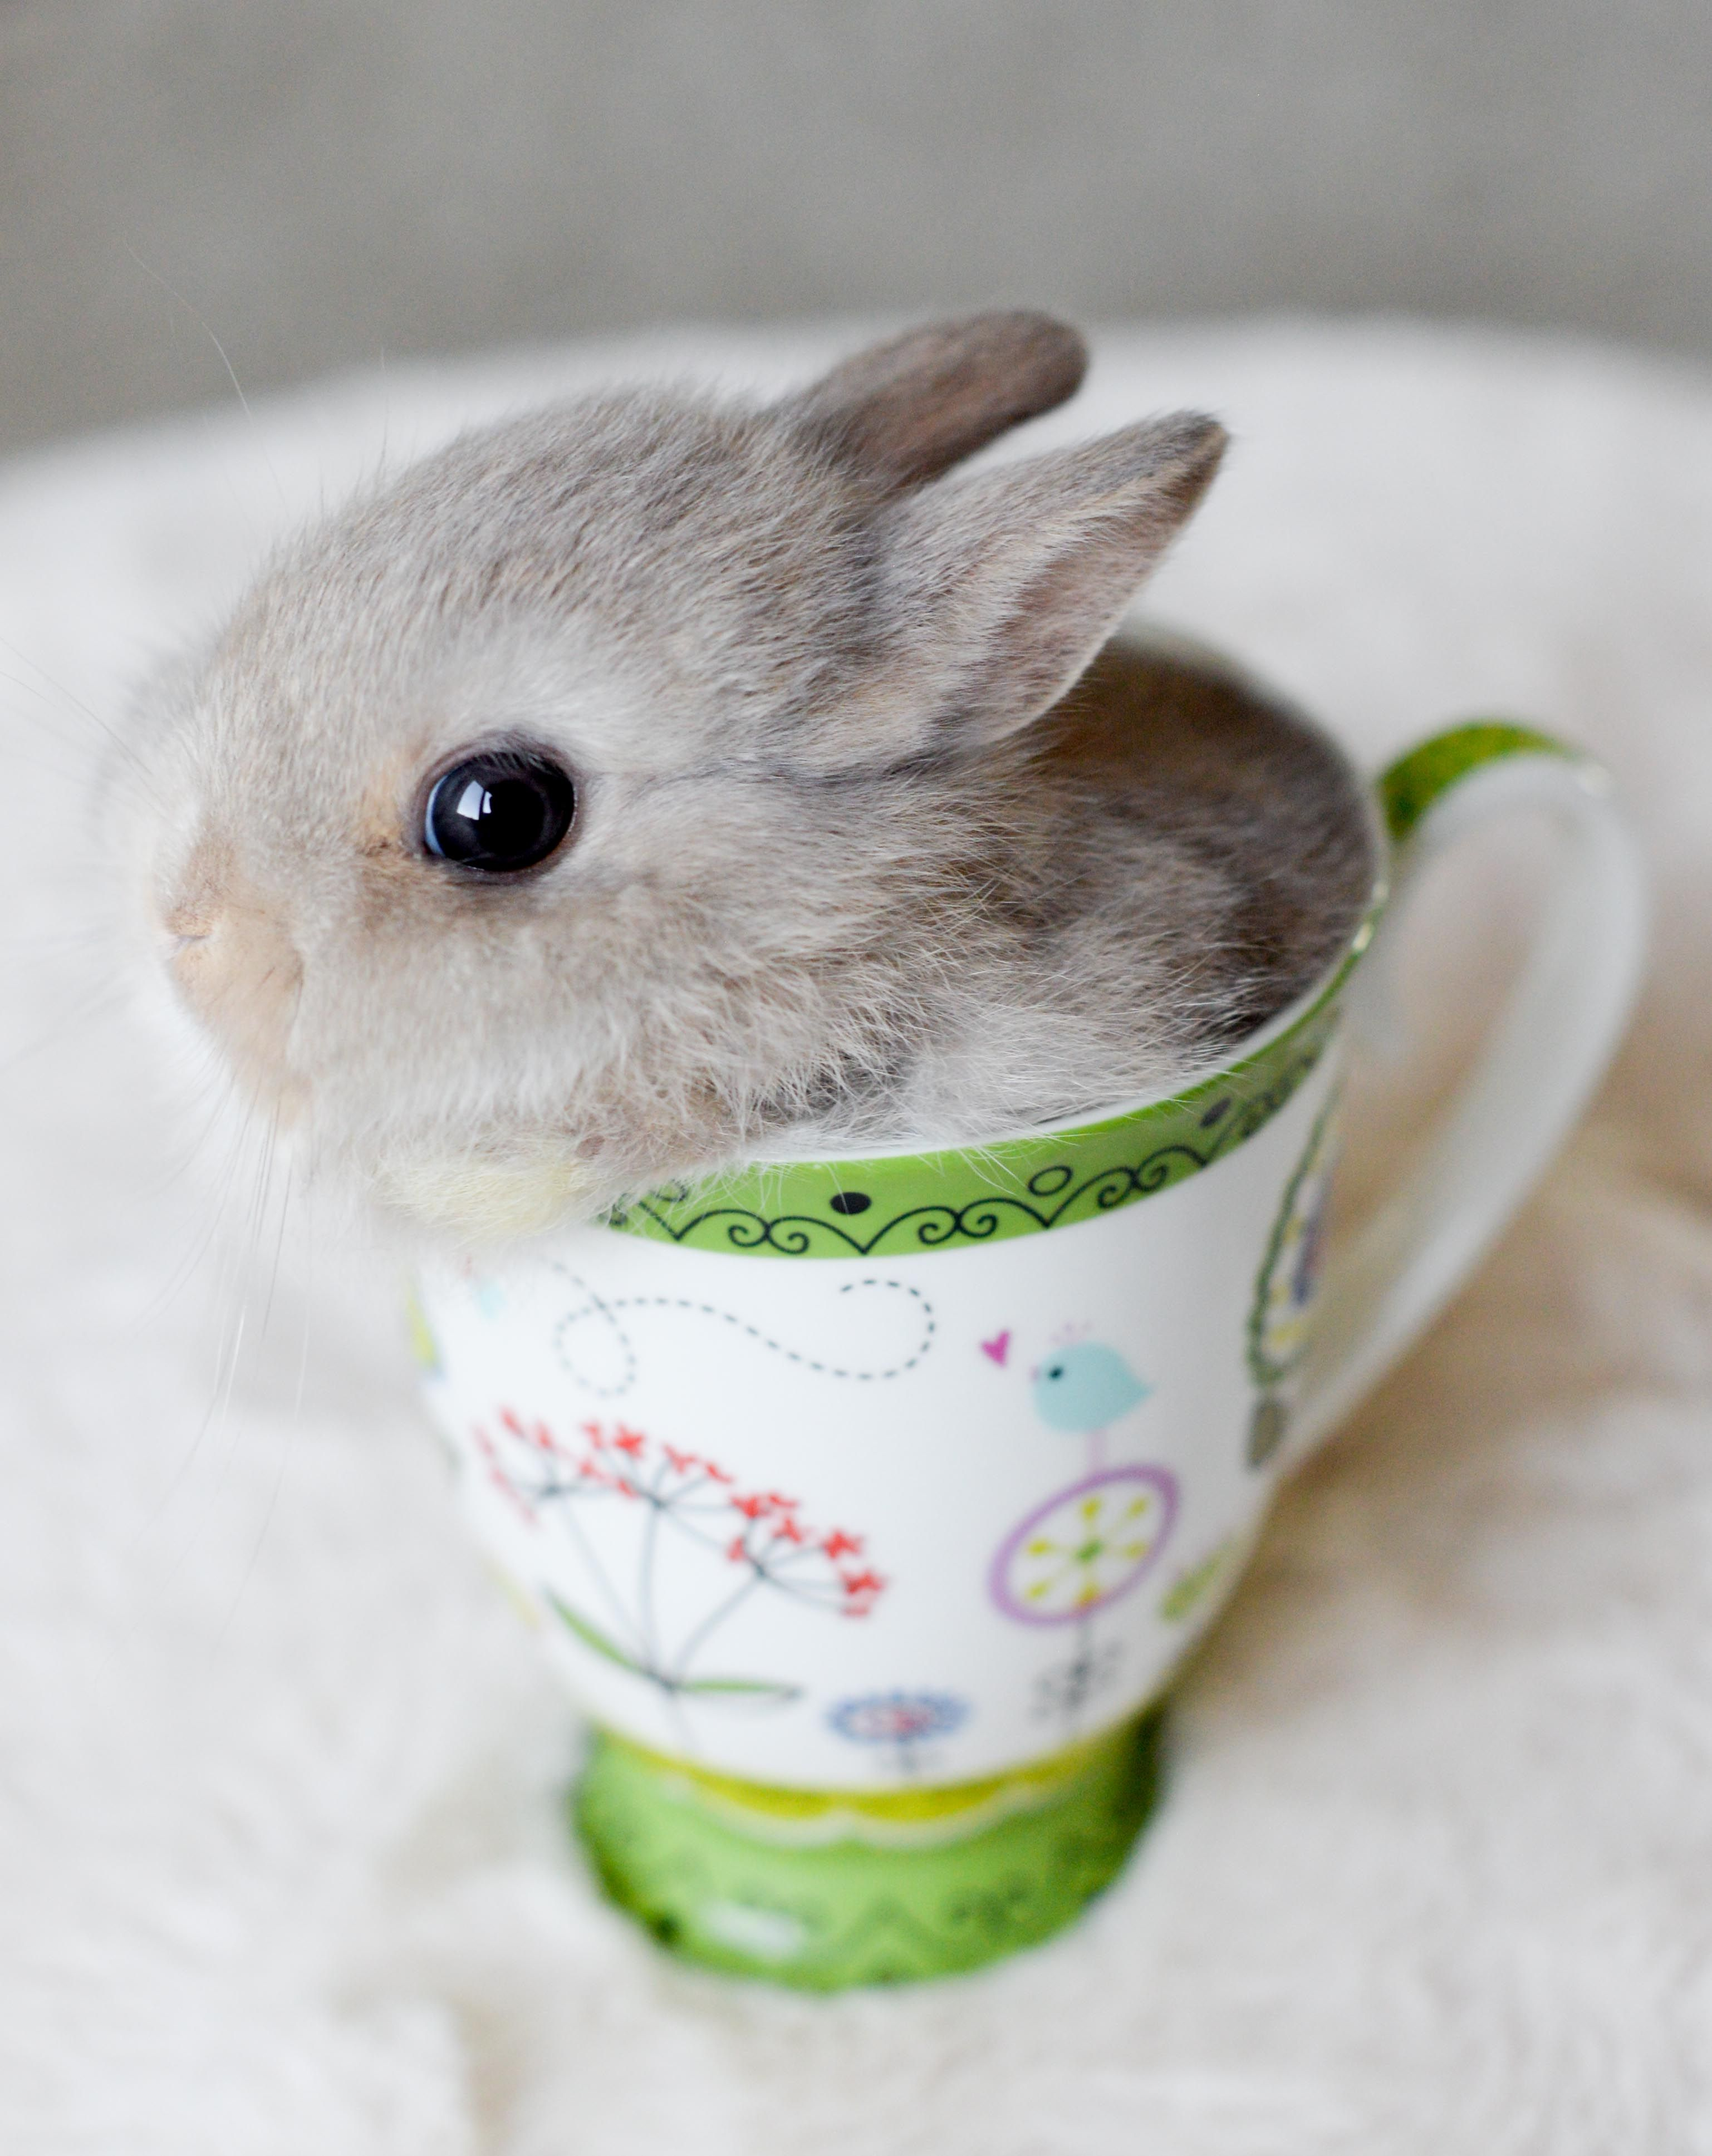 Baby Teacup Bunnies : teacup, bunnies, Teacup, Bunny., Animals,, Animals